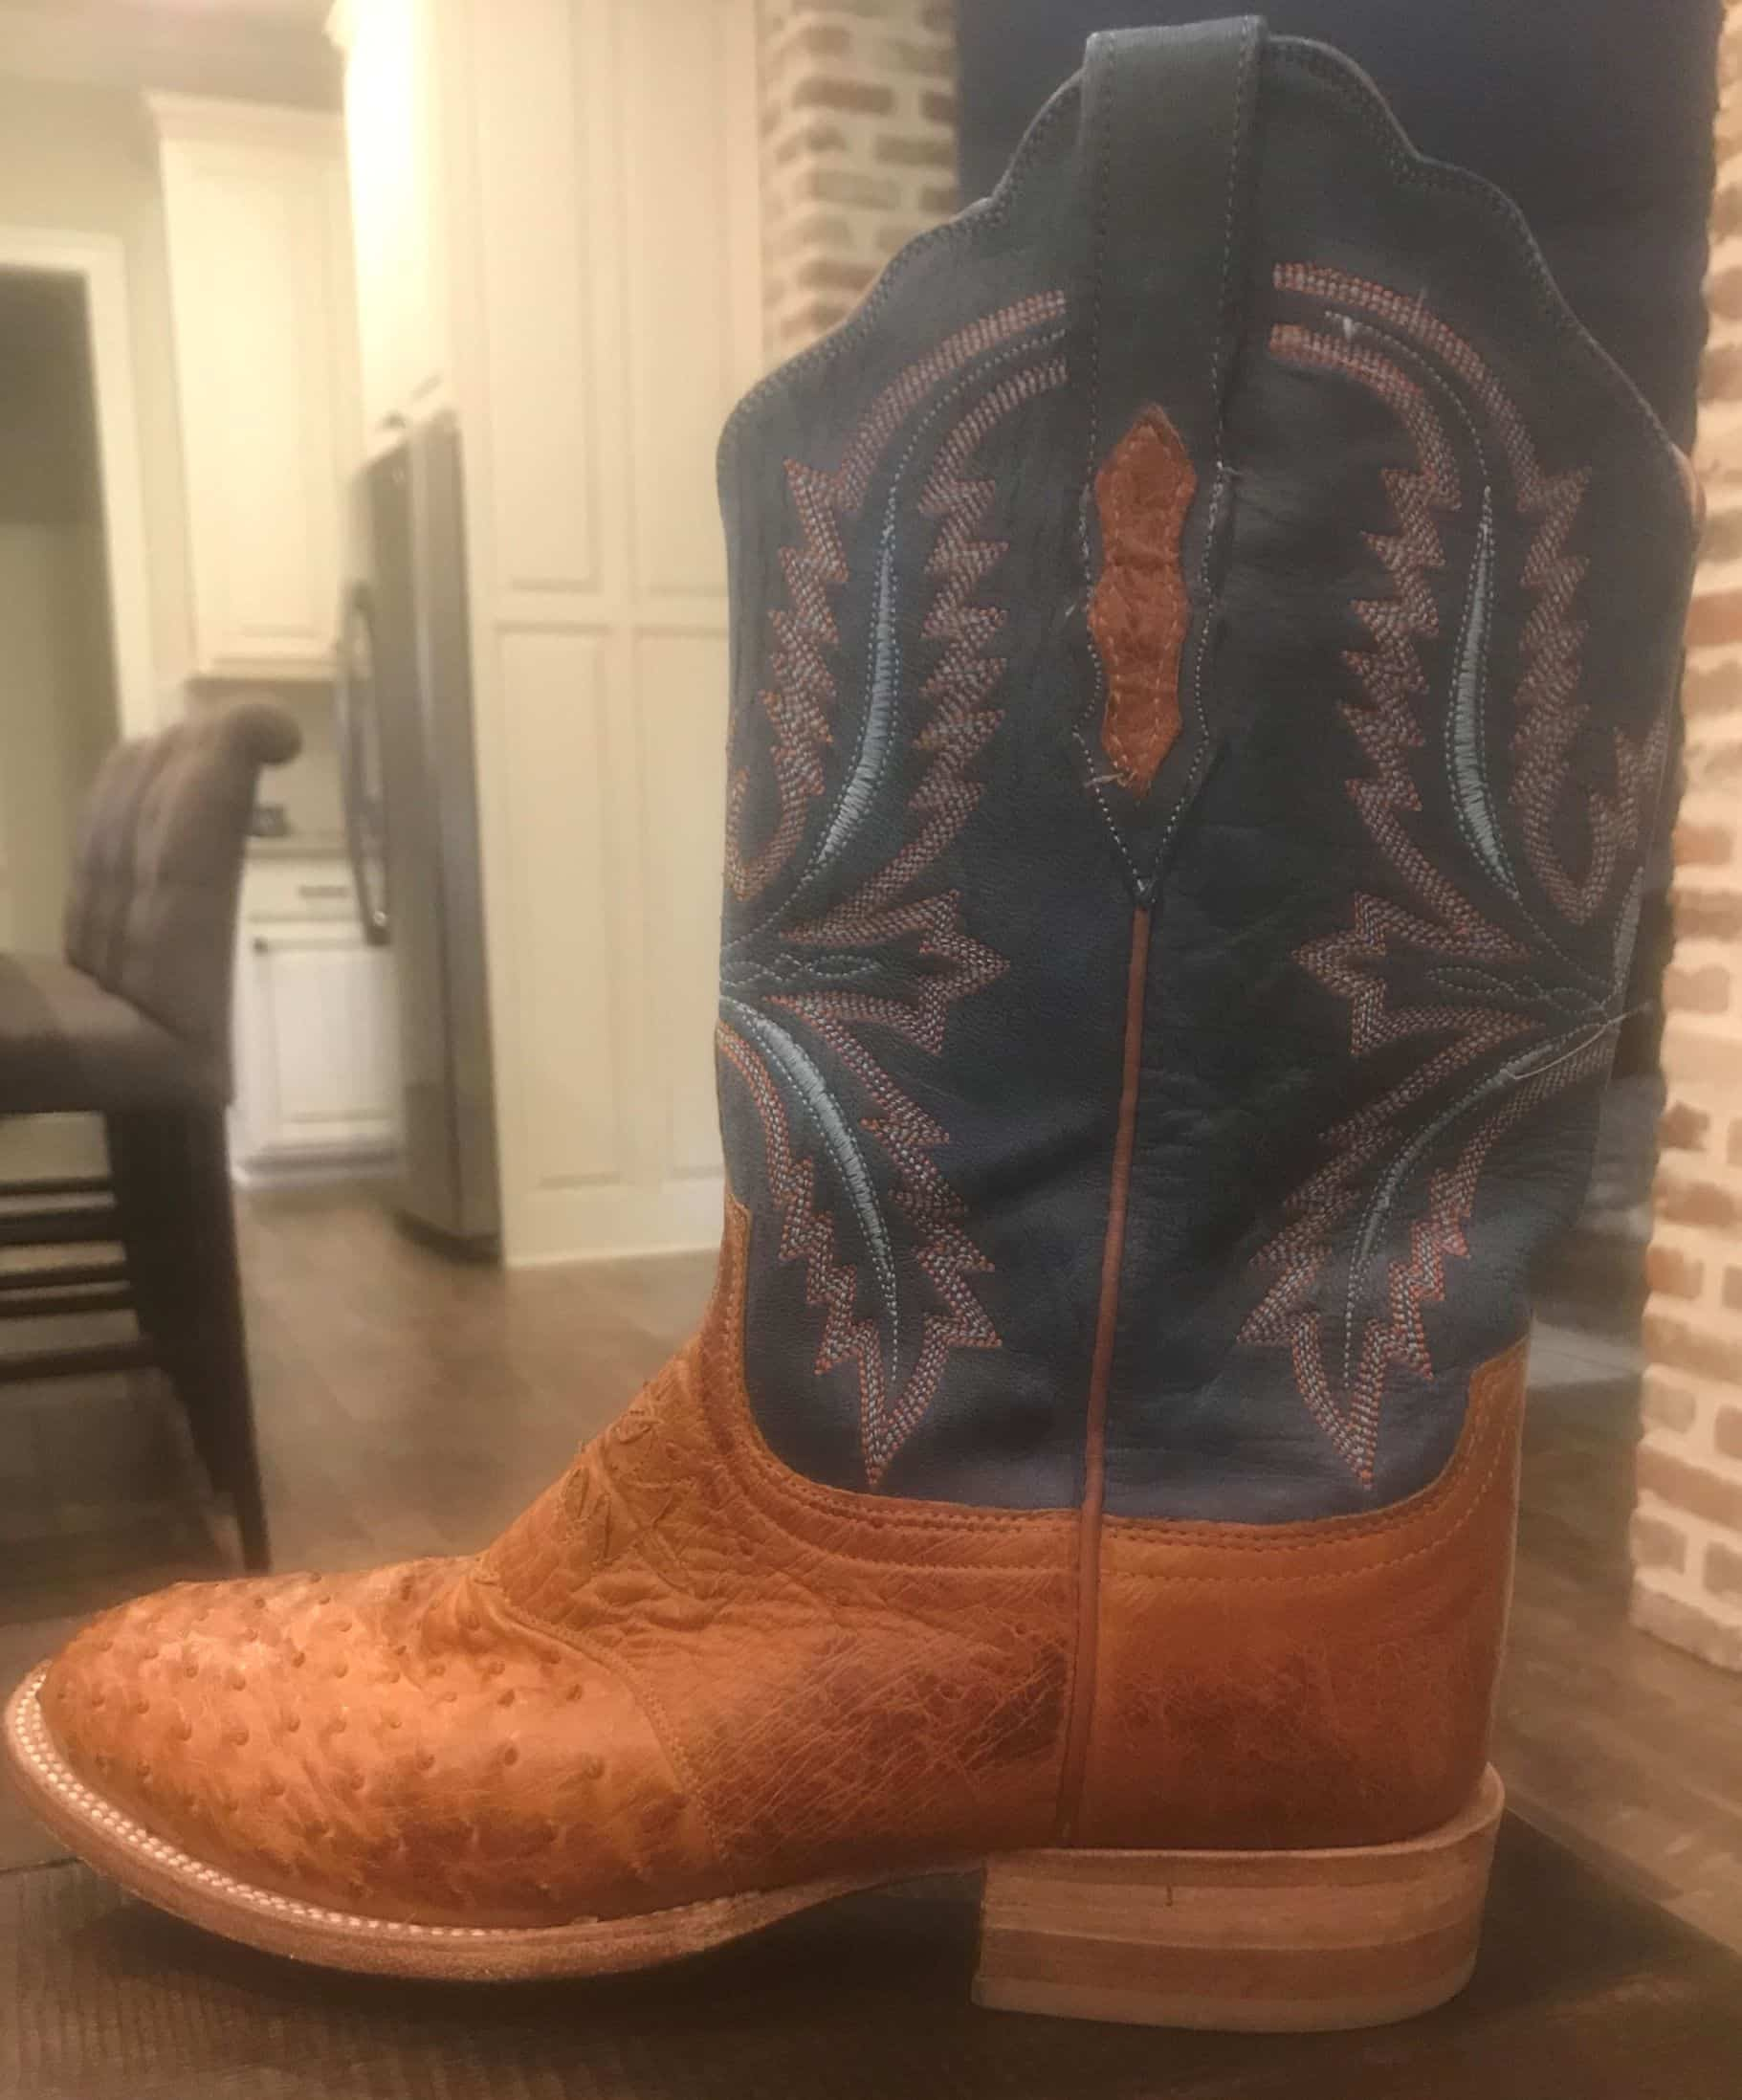 Western Horseback Riding: The Cowboy